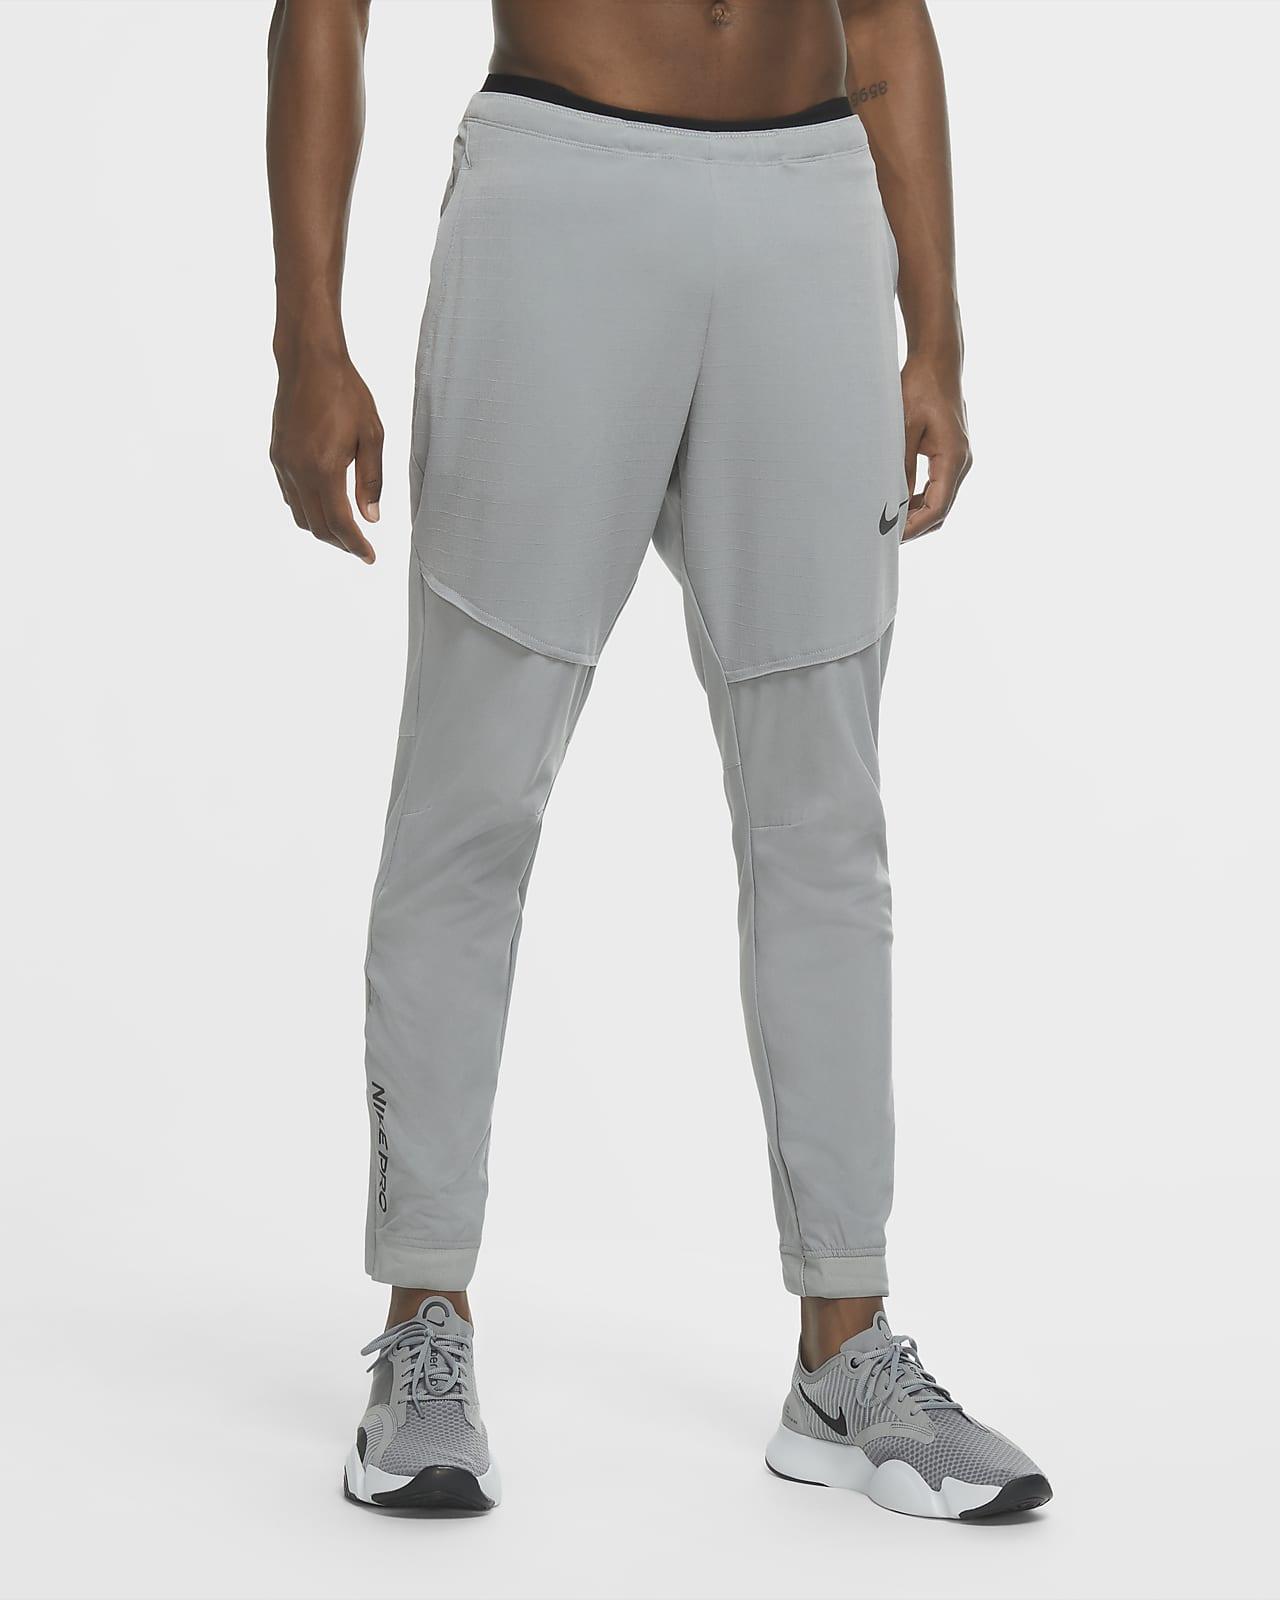 Nike Pro Flex Rep Men's Trousers